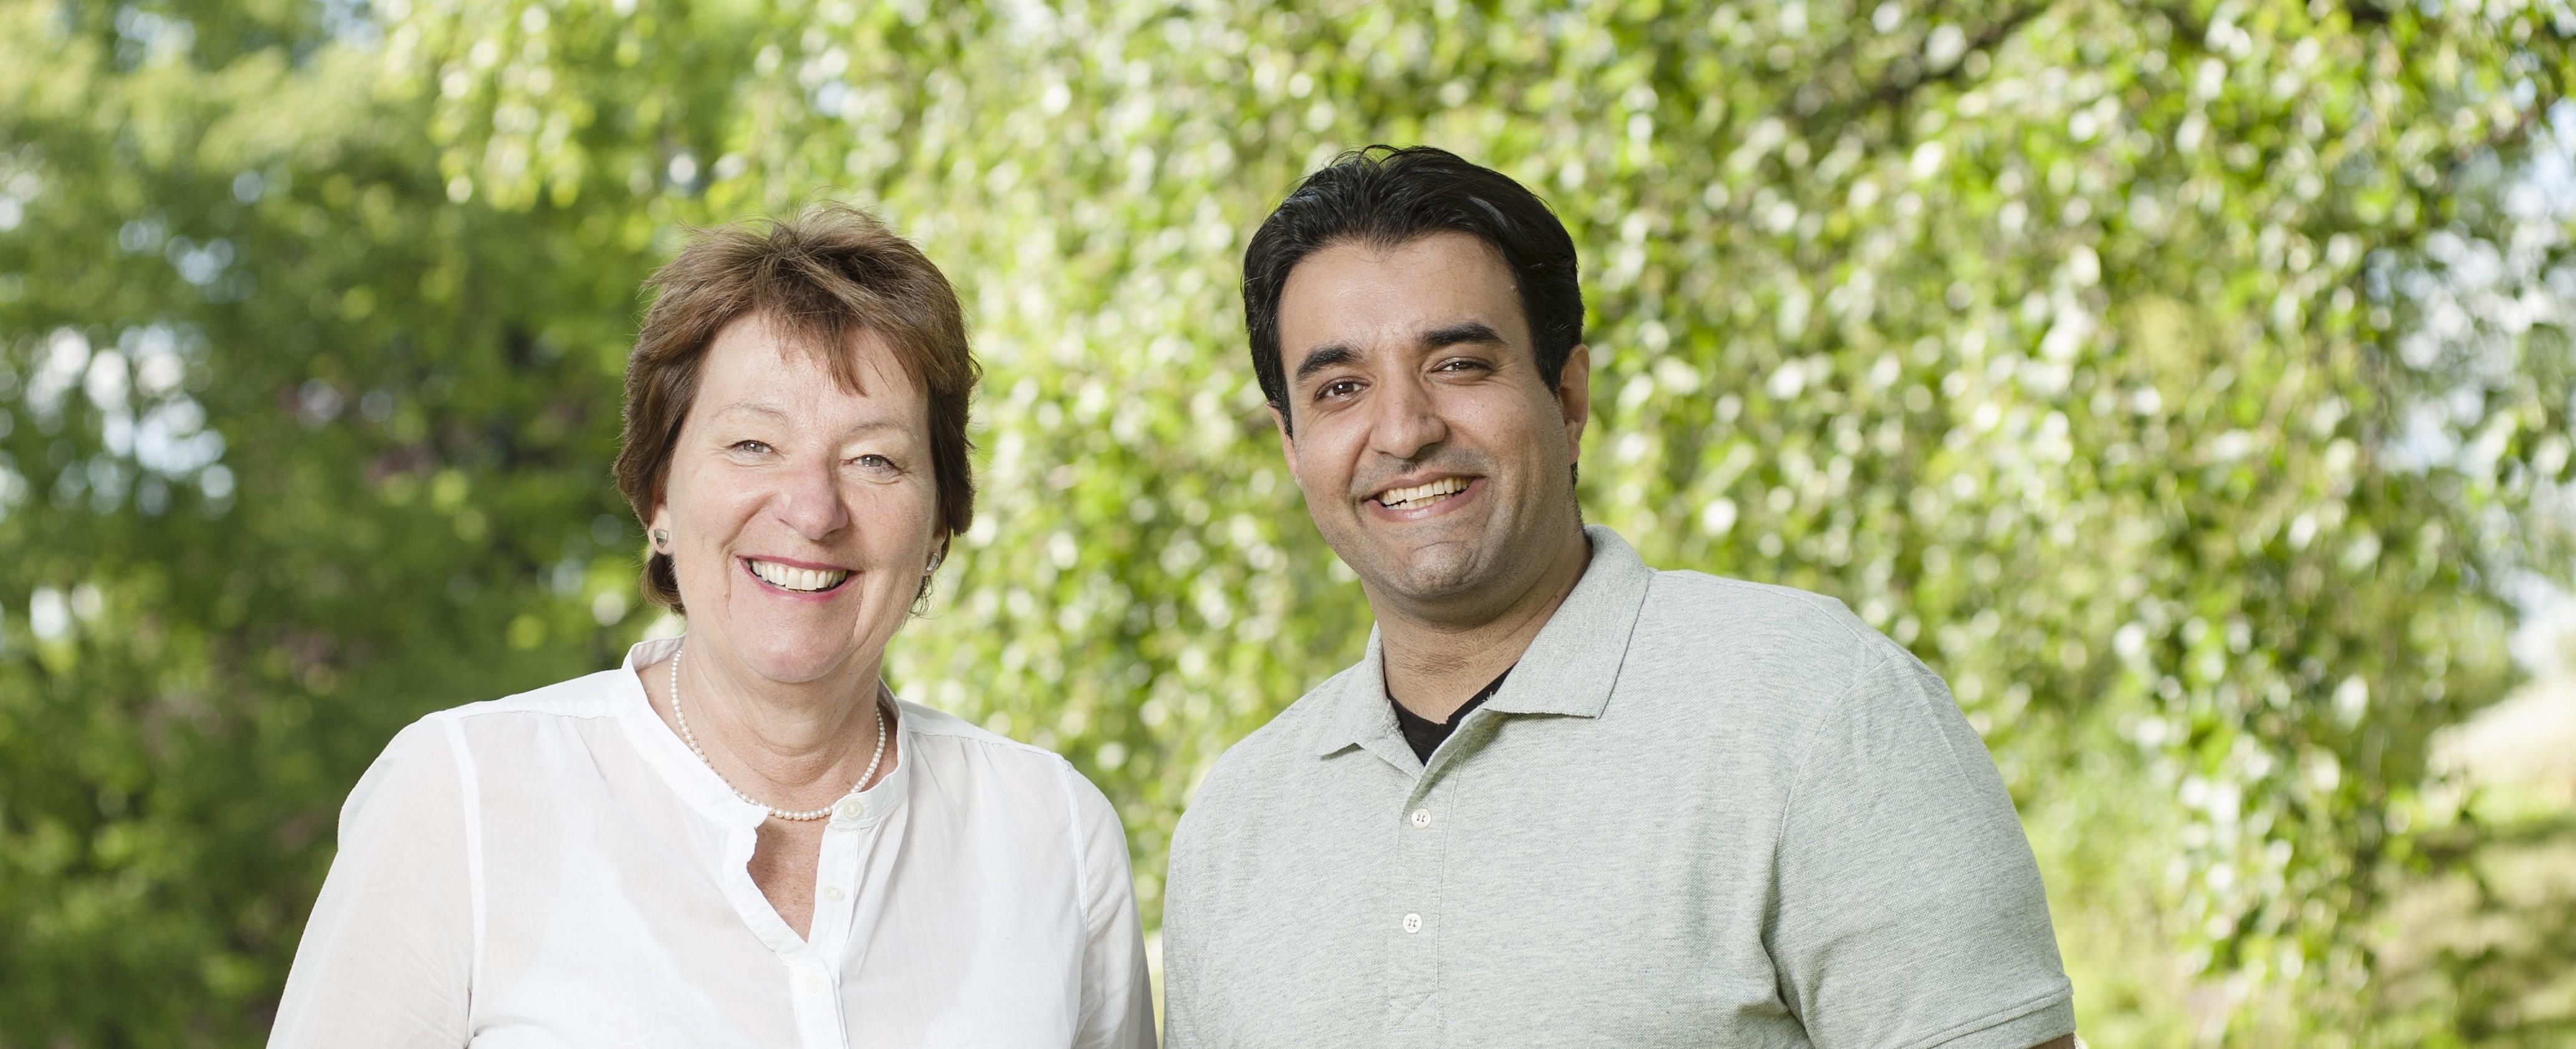 1. og 2. kandidat. Marianne Borgen og Siavash Sangtarash